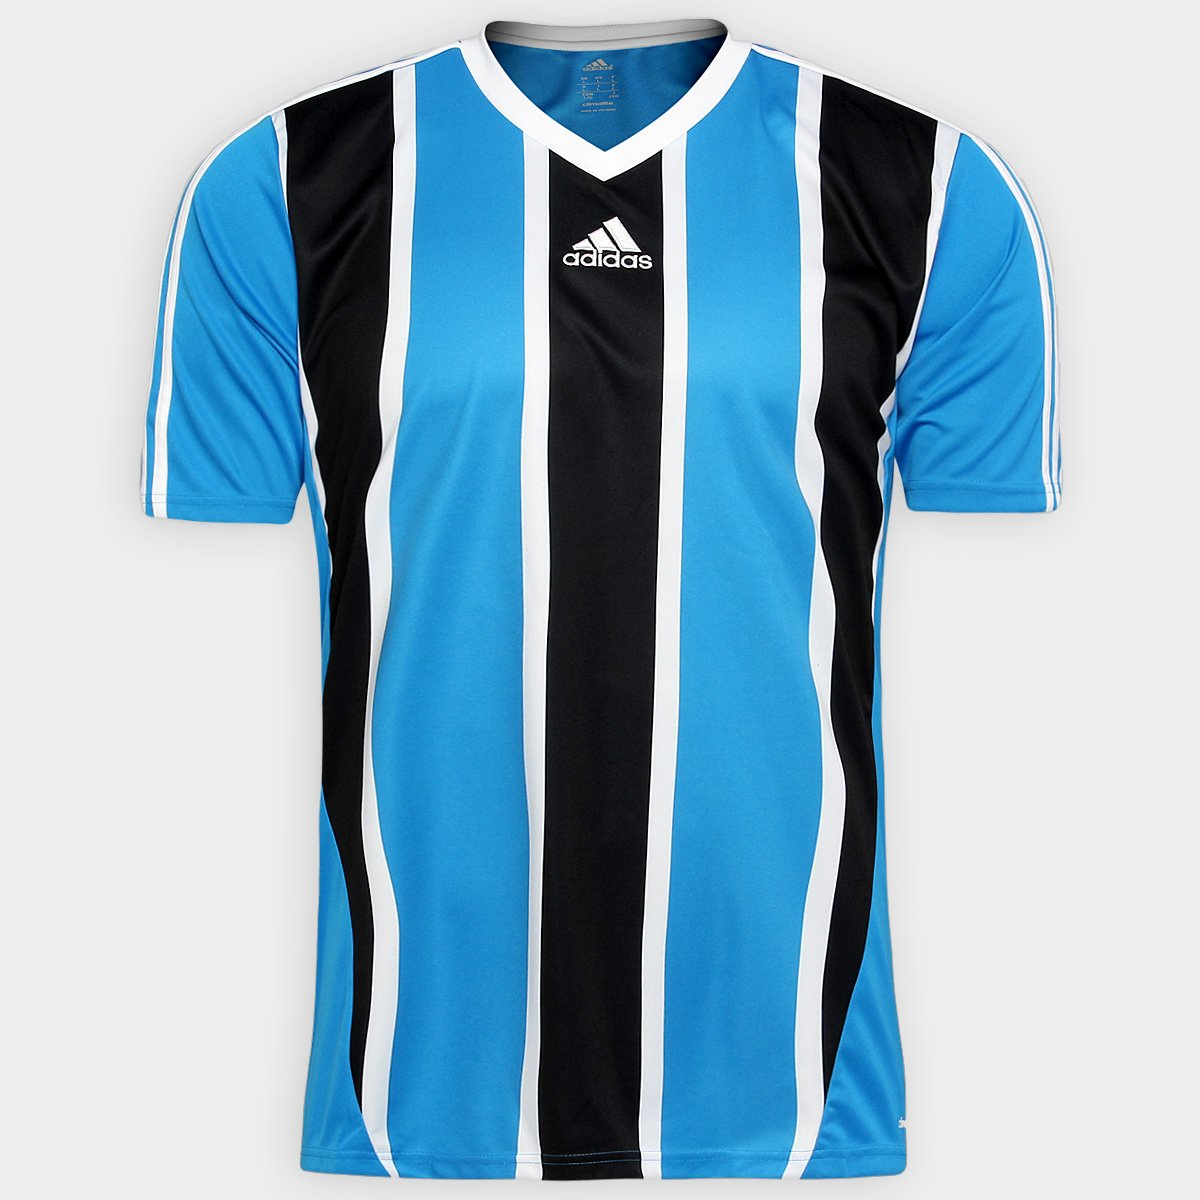 ... Camisa Adidas Inspired Masculina - Compre Agora Netshoes los angeles  9b1c1 b4586 ... 4e37d49e89306